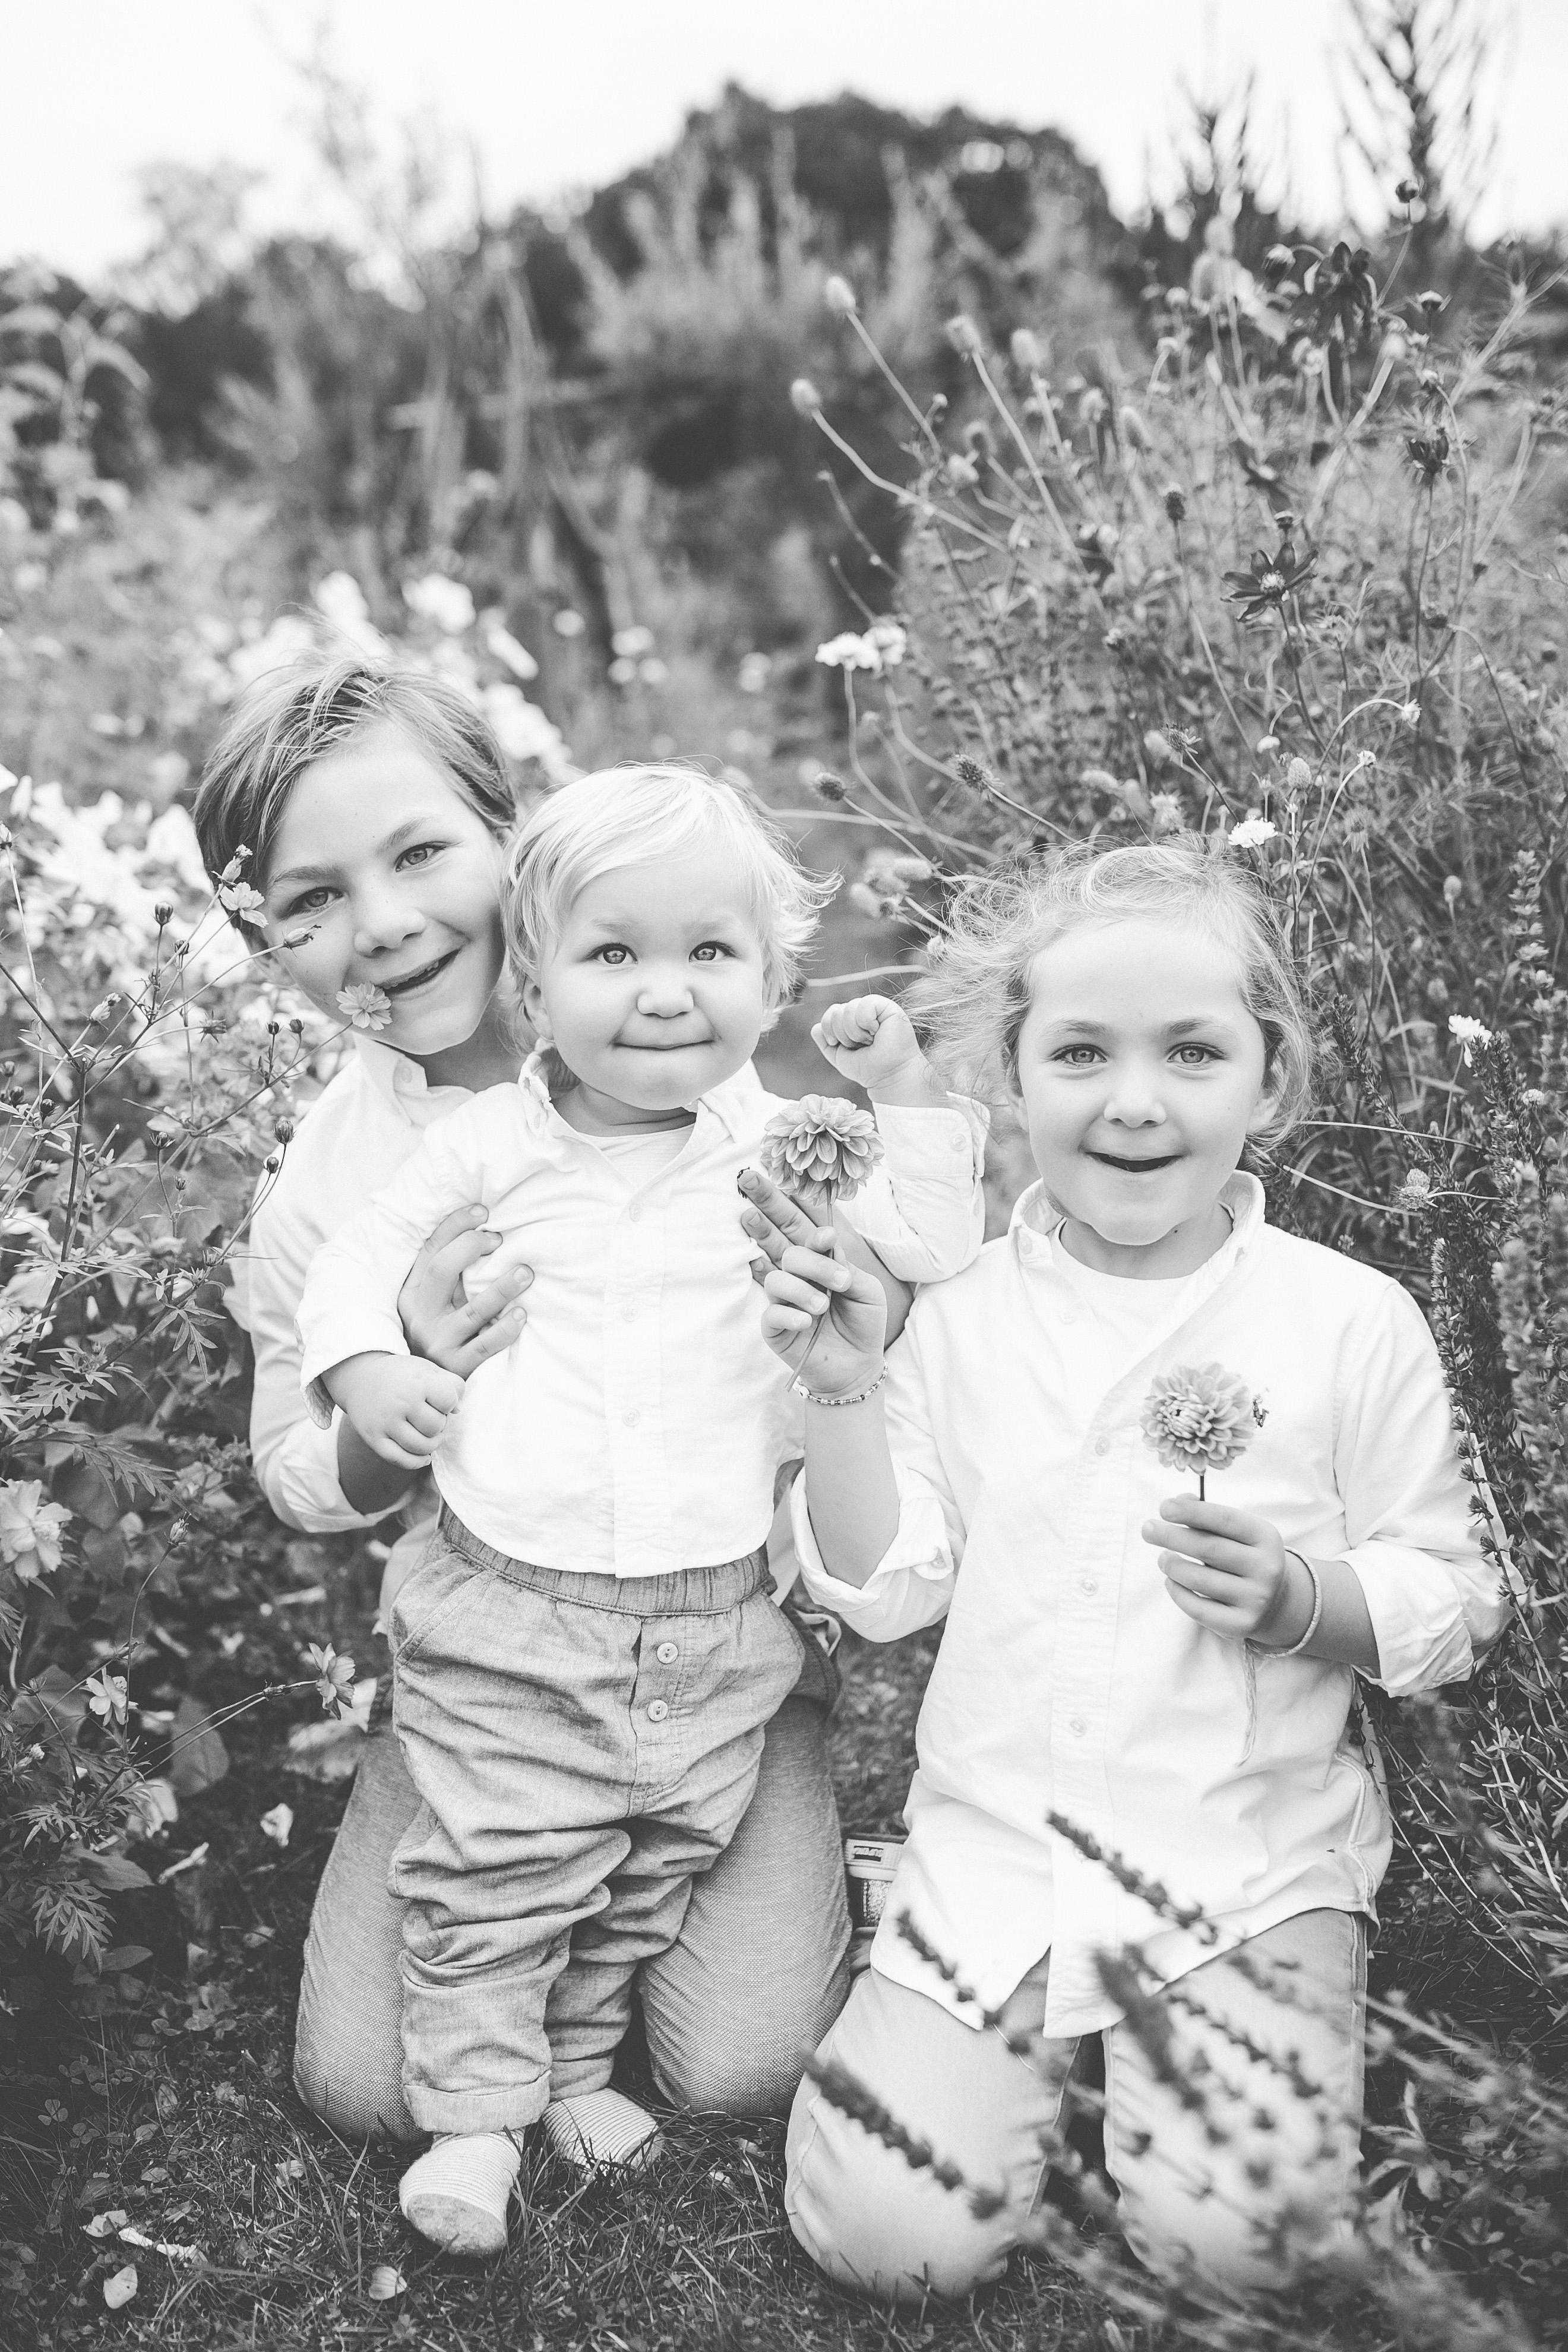 Mattheo, Olivia & Emmanuel-4206-3